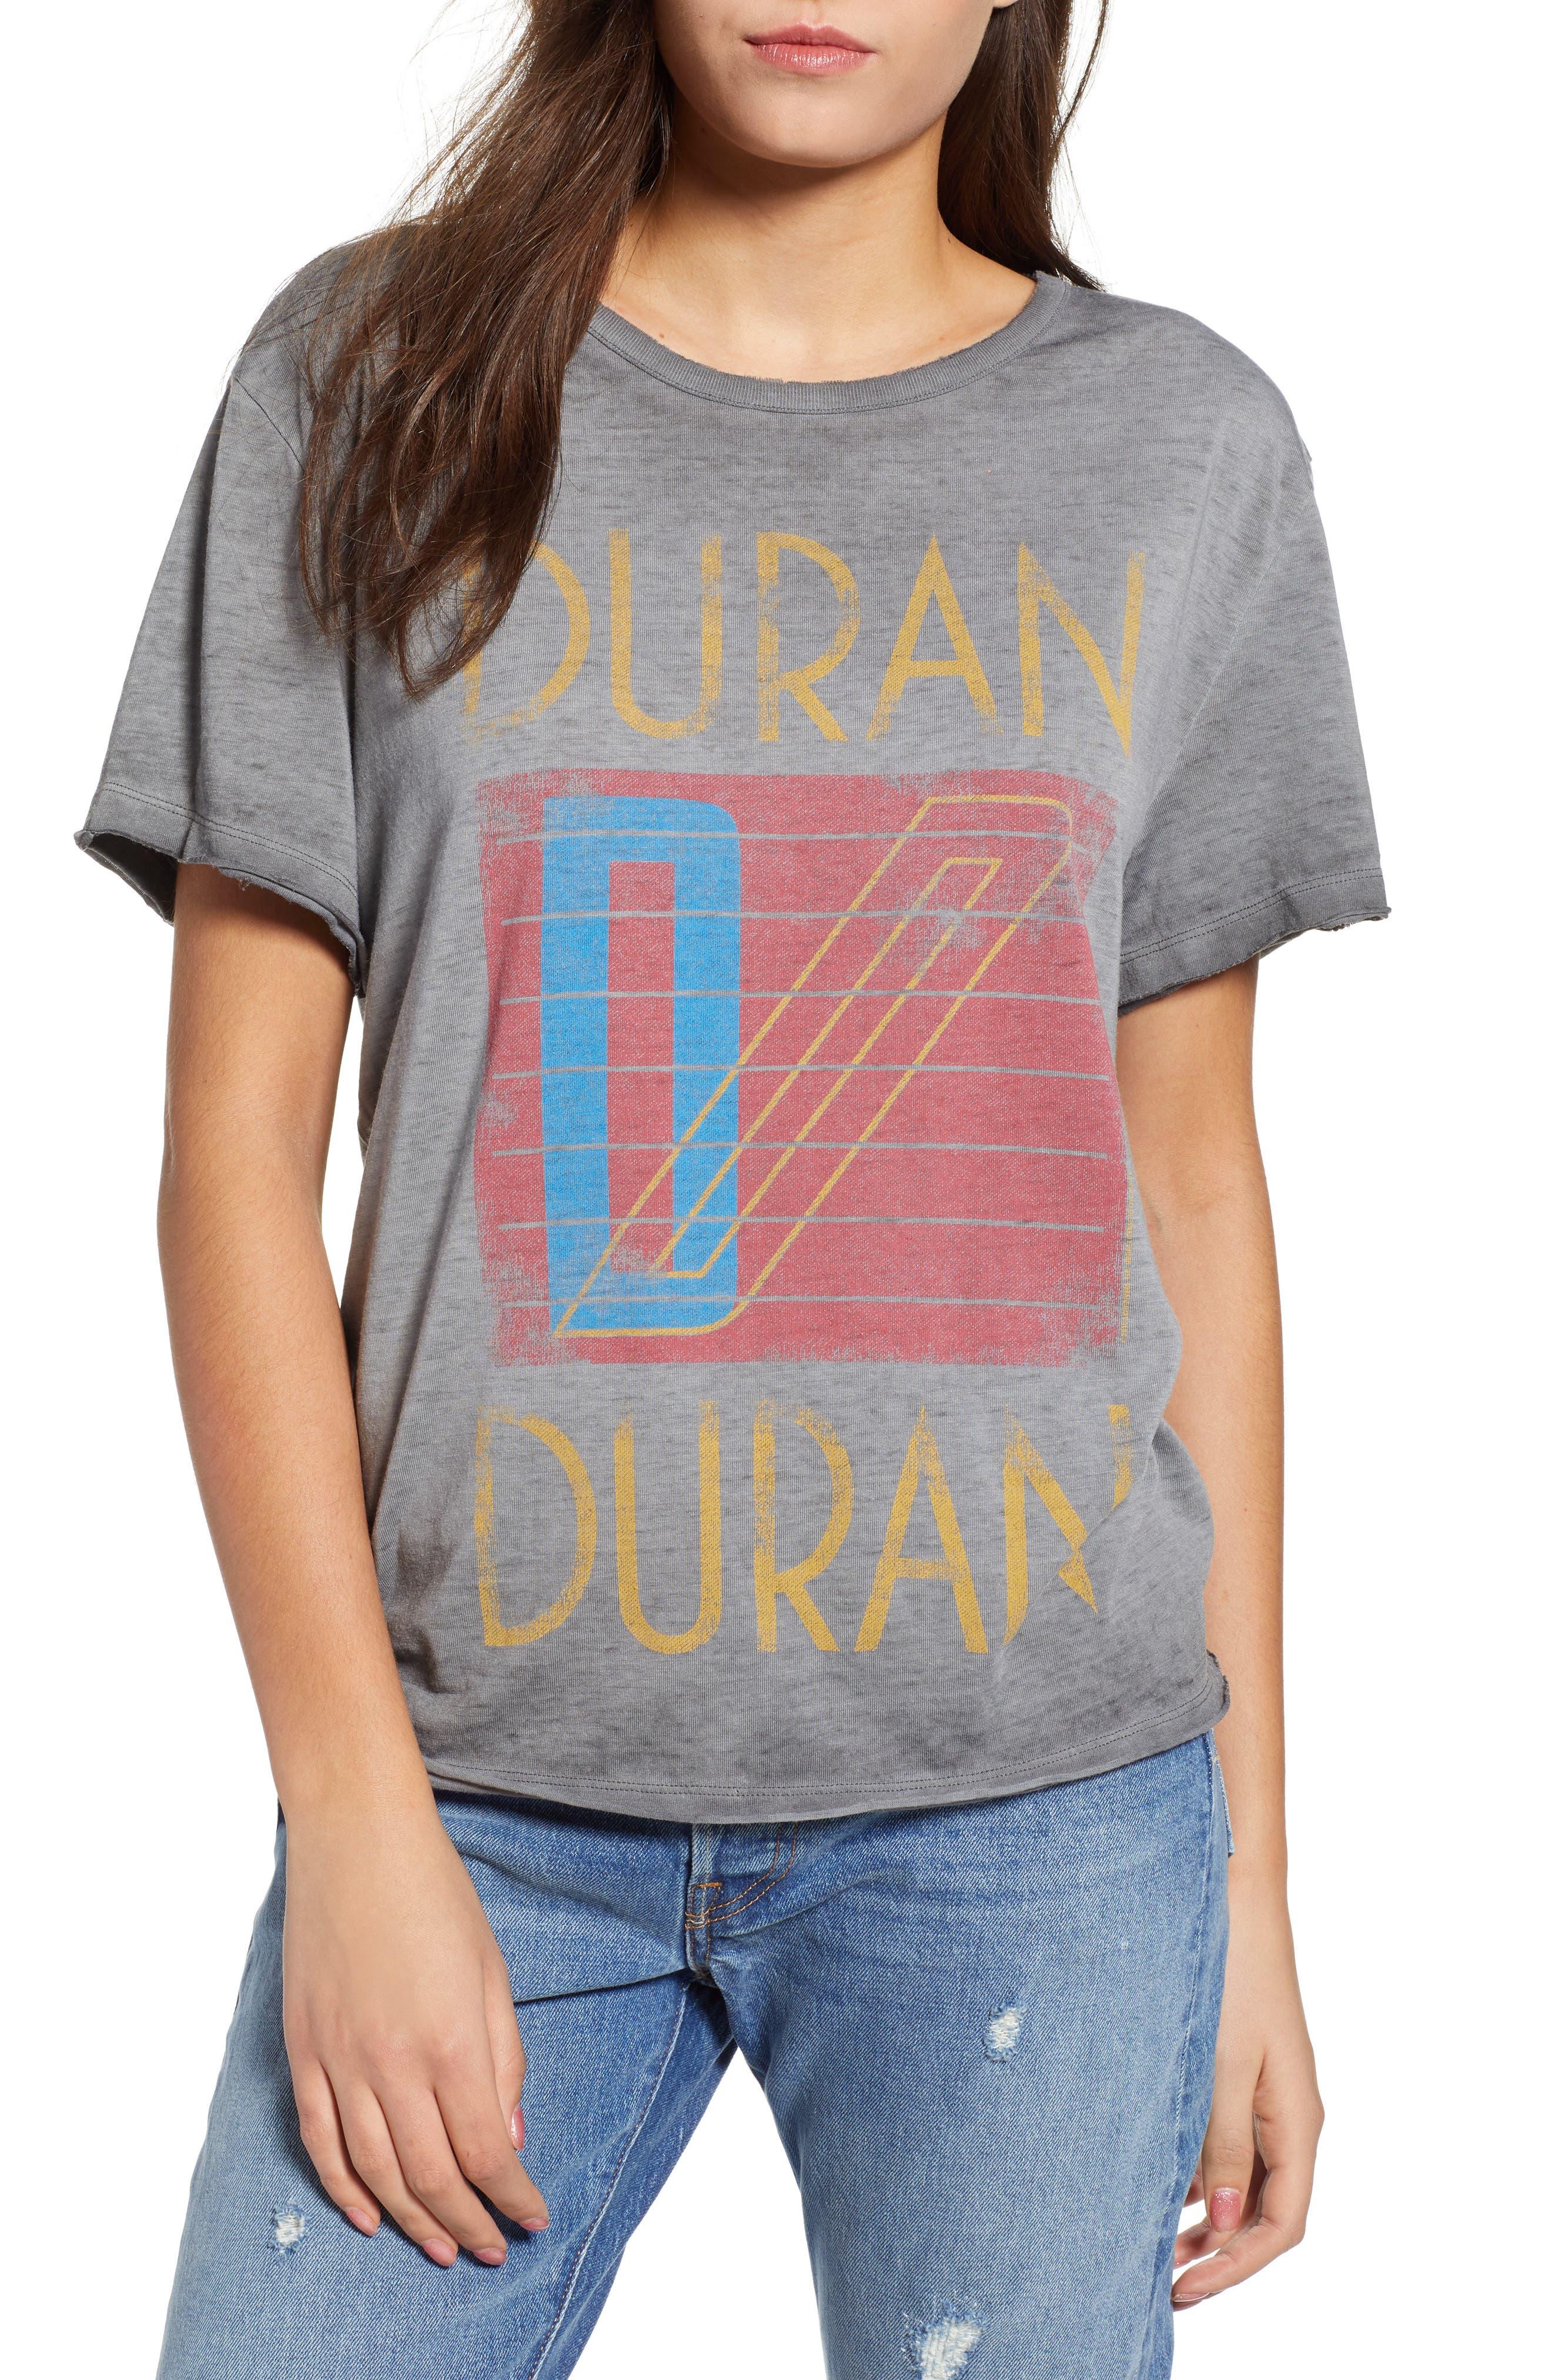 Duran Duran Tee,                             Main thumbnail 1, color,                             GREY